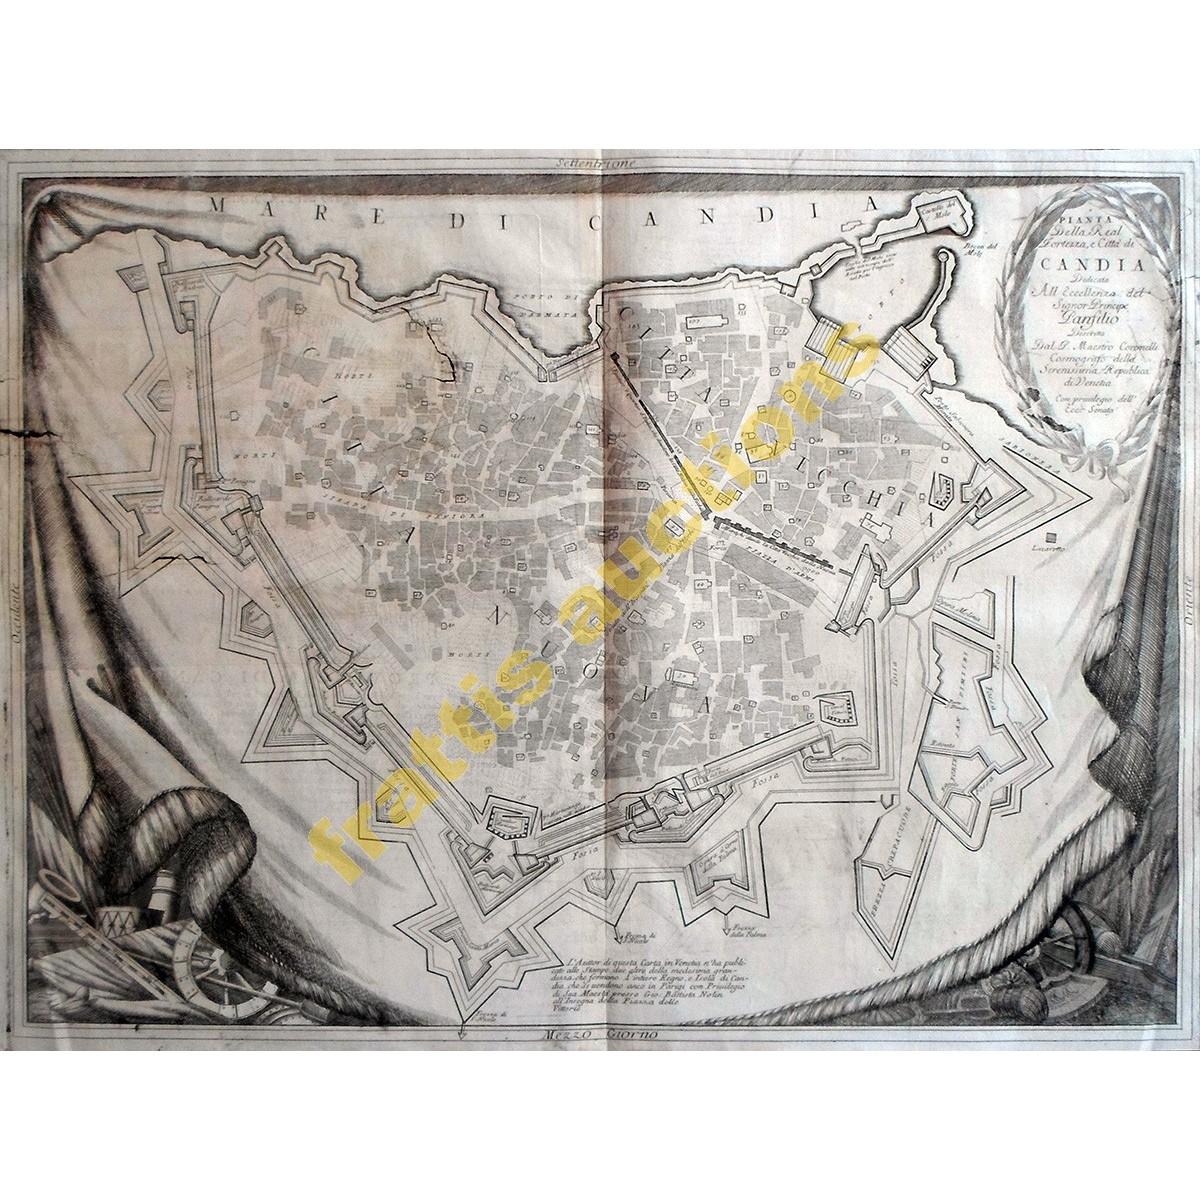 CORONELLI 1696 ,χάρτης